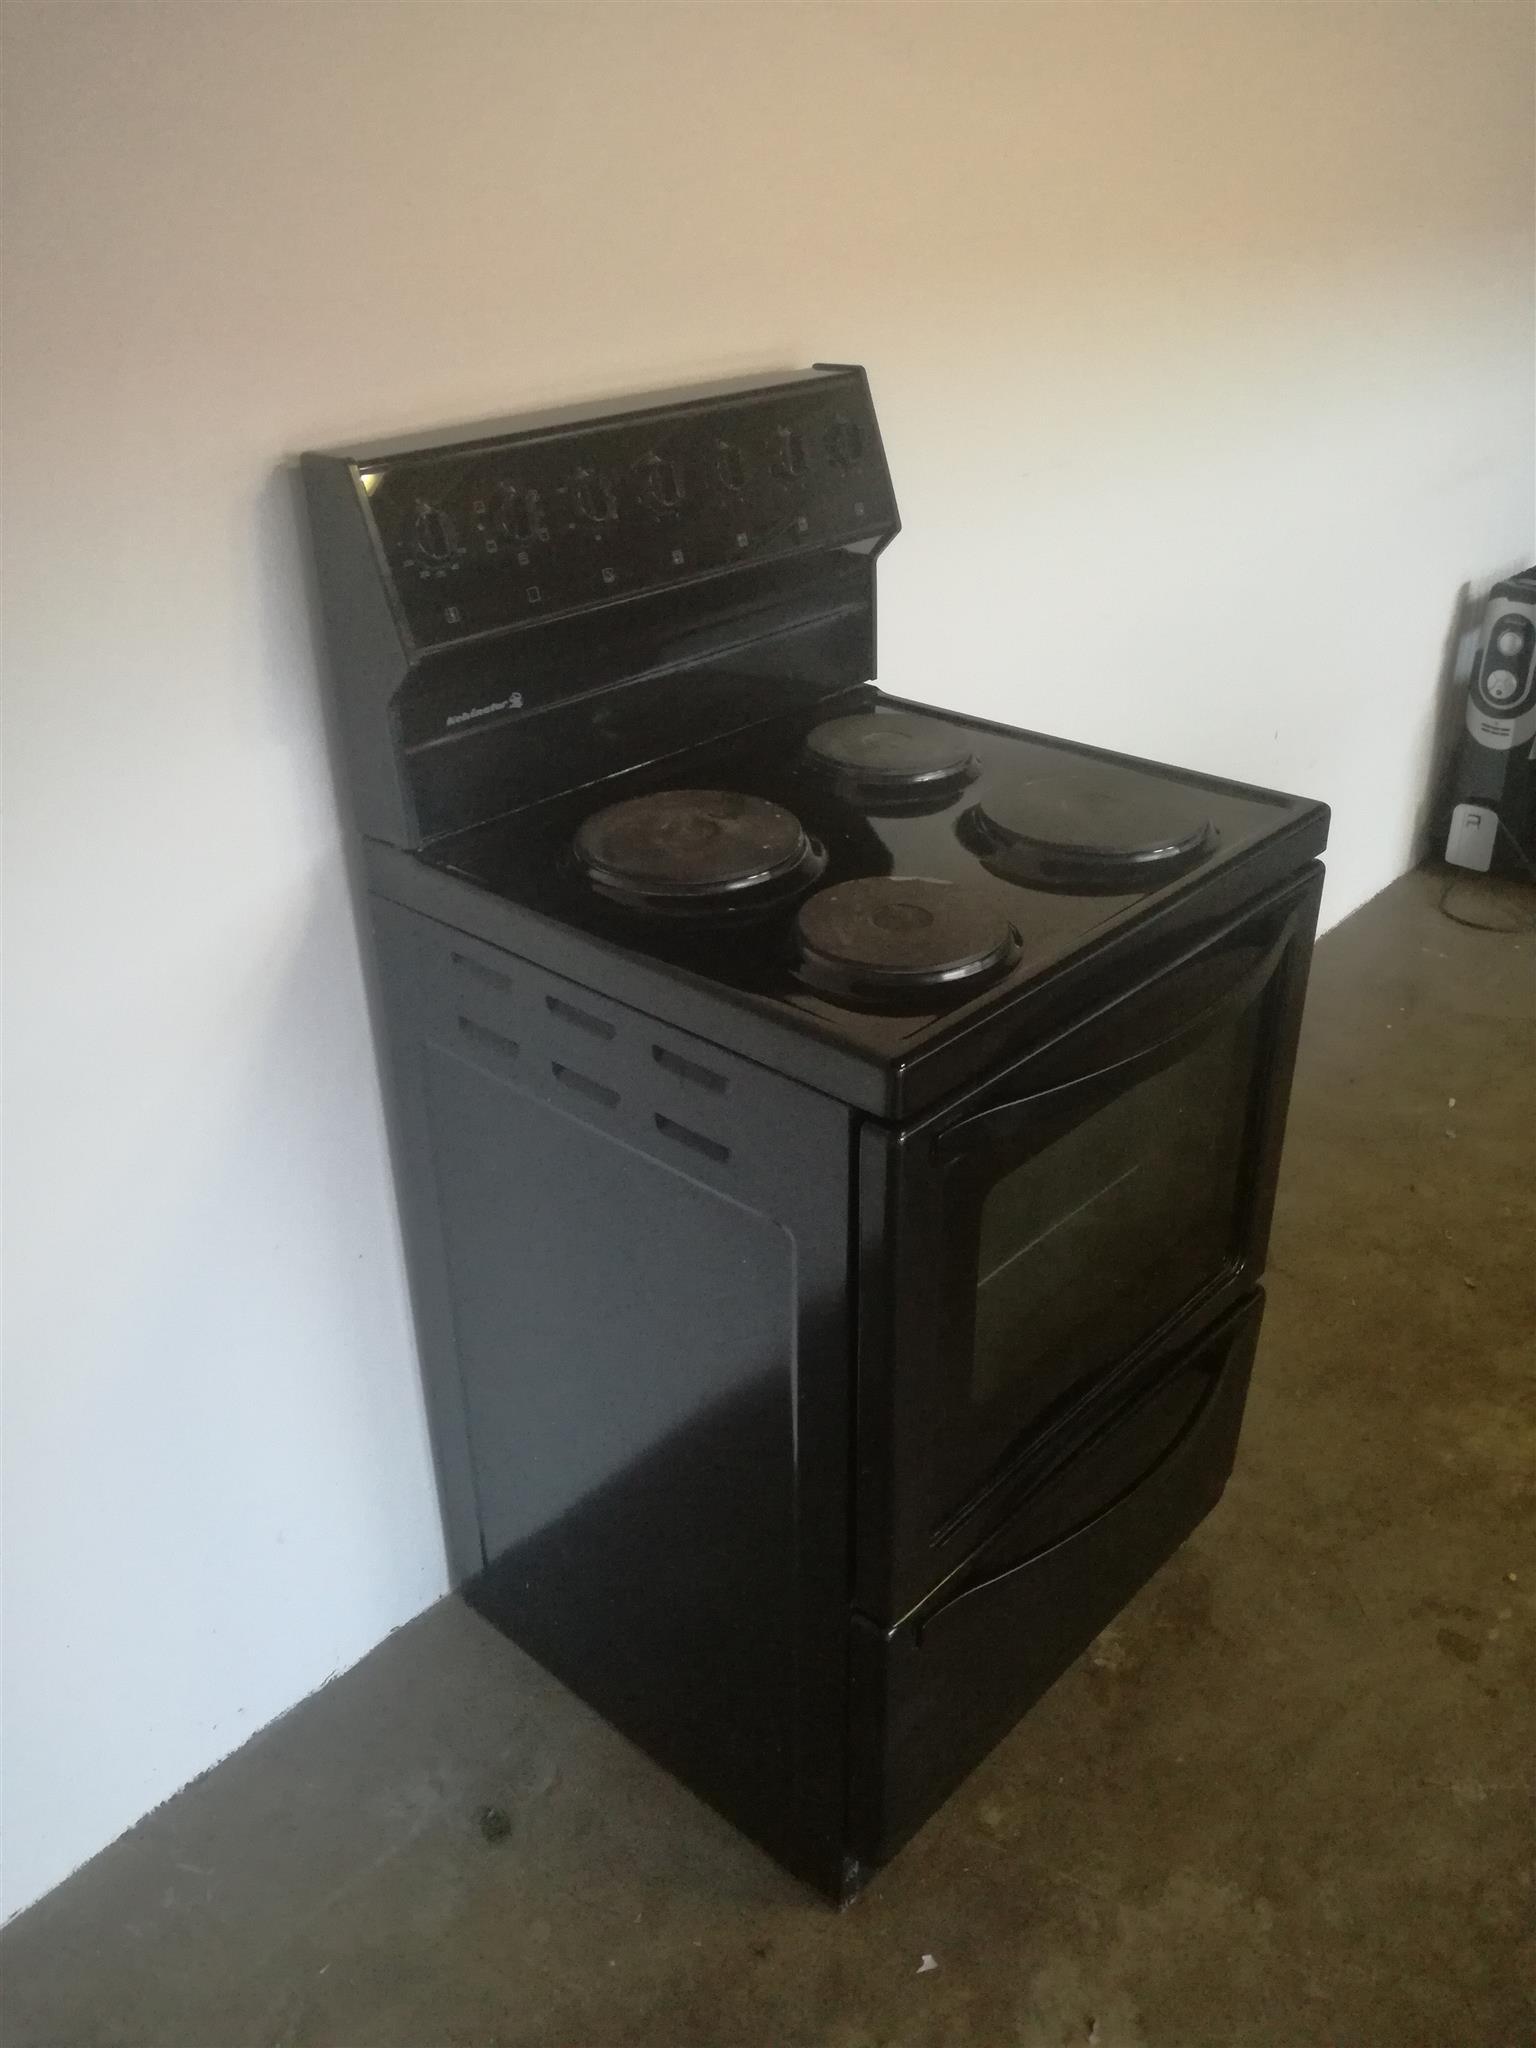 Kelvenator 4plate electronic stove for sale